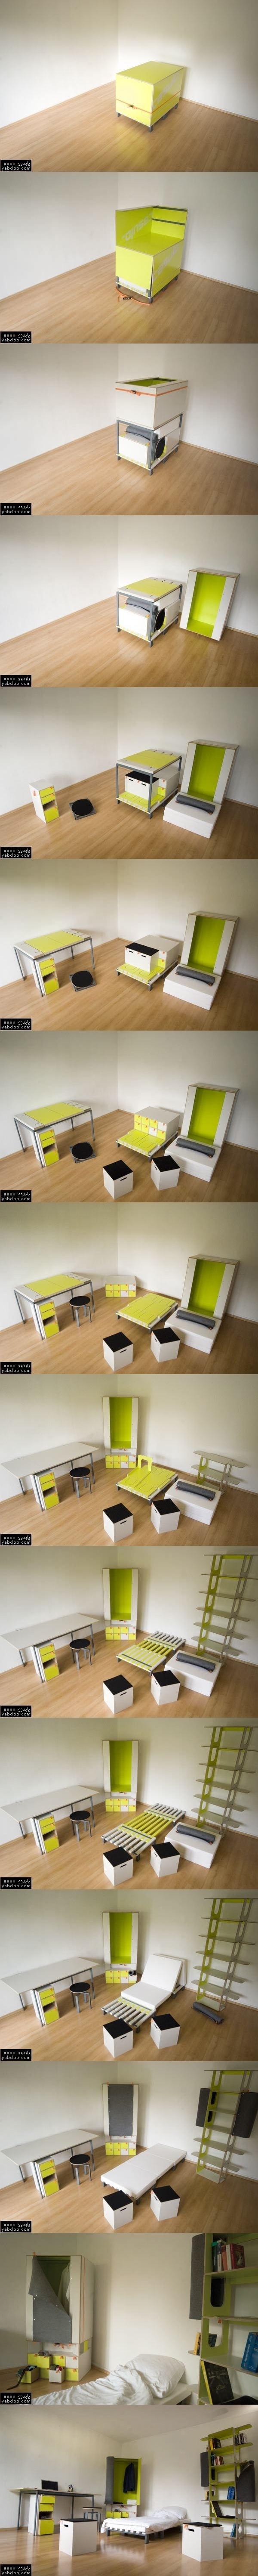 A Small Yellow Box